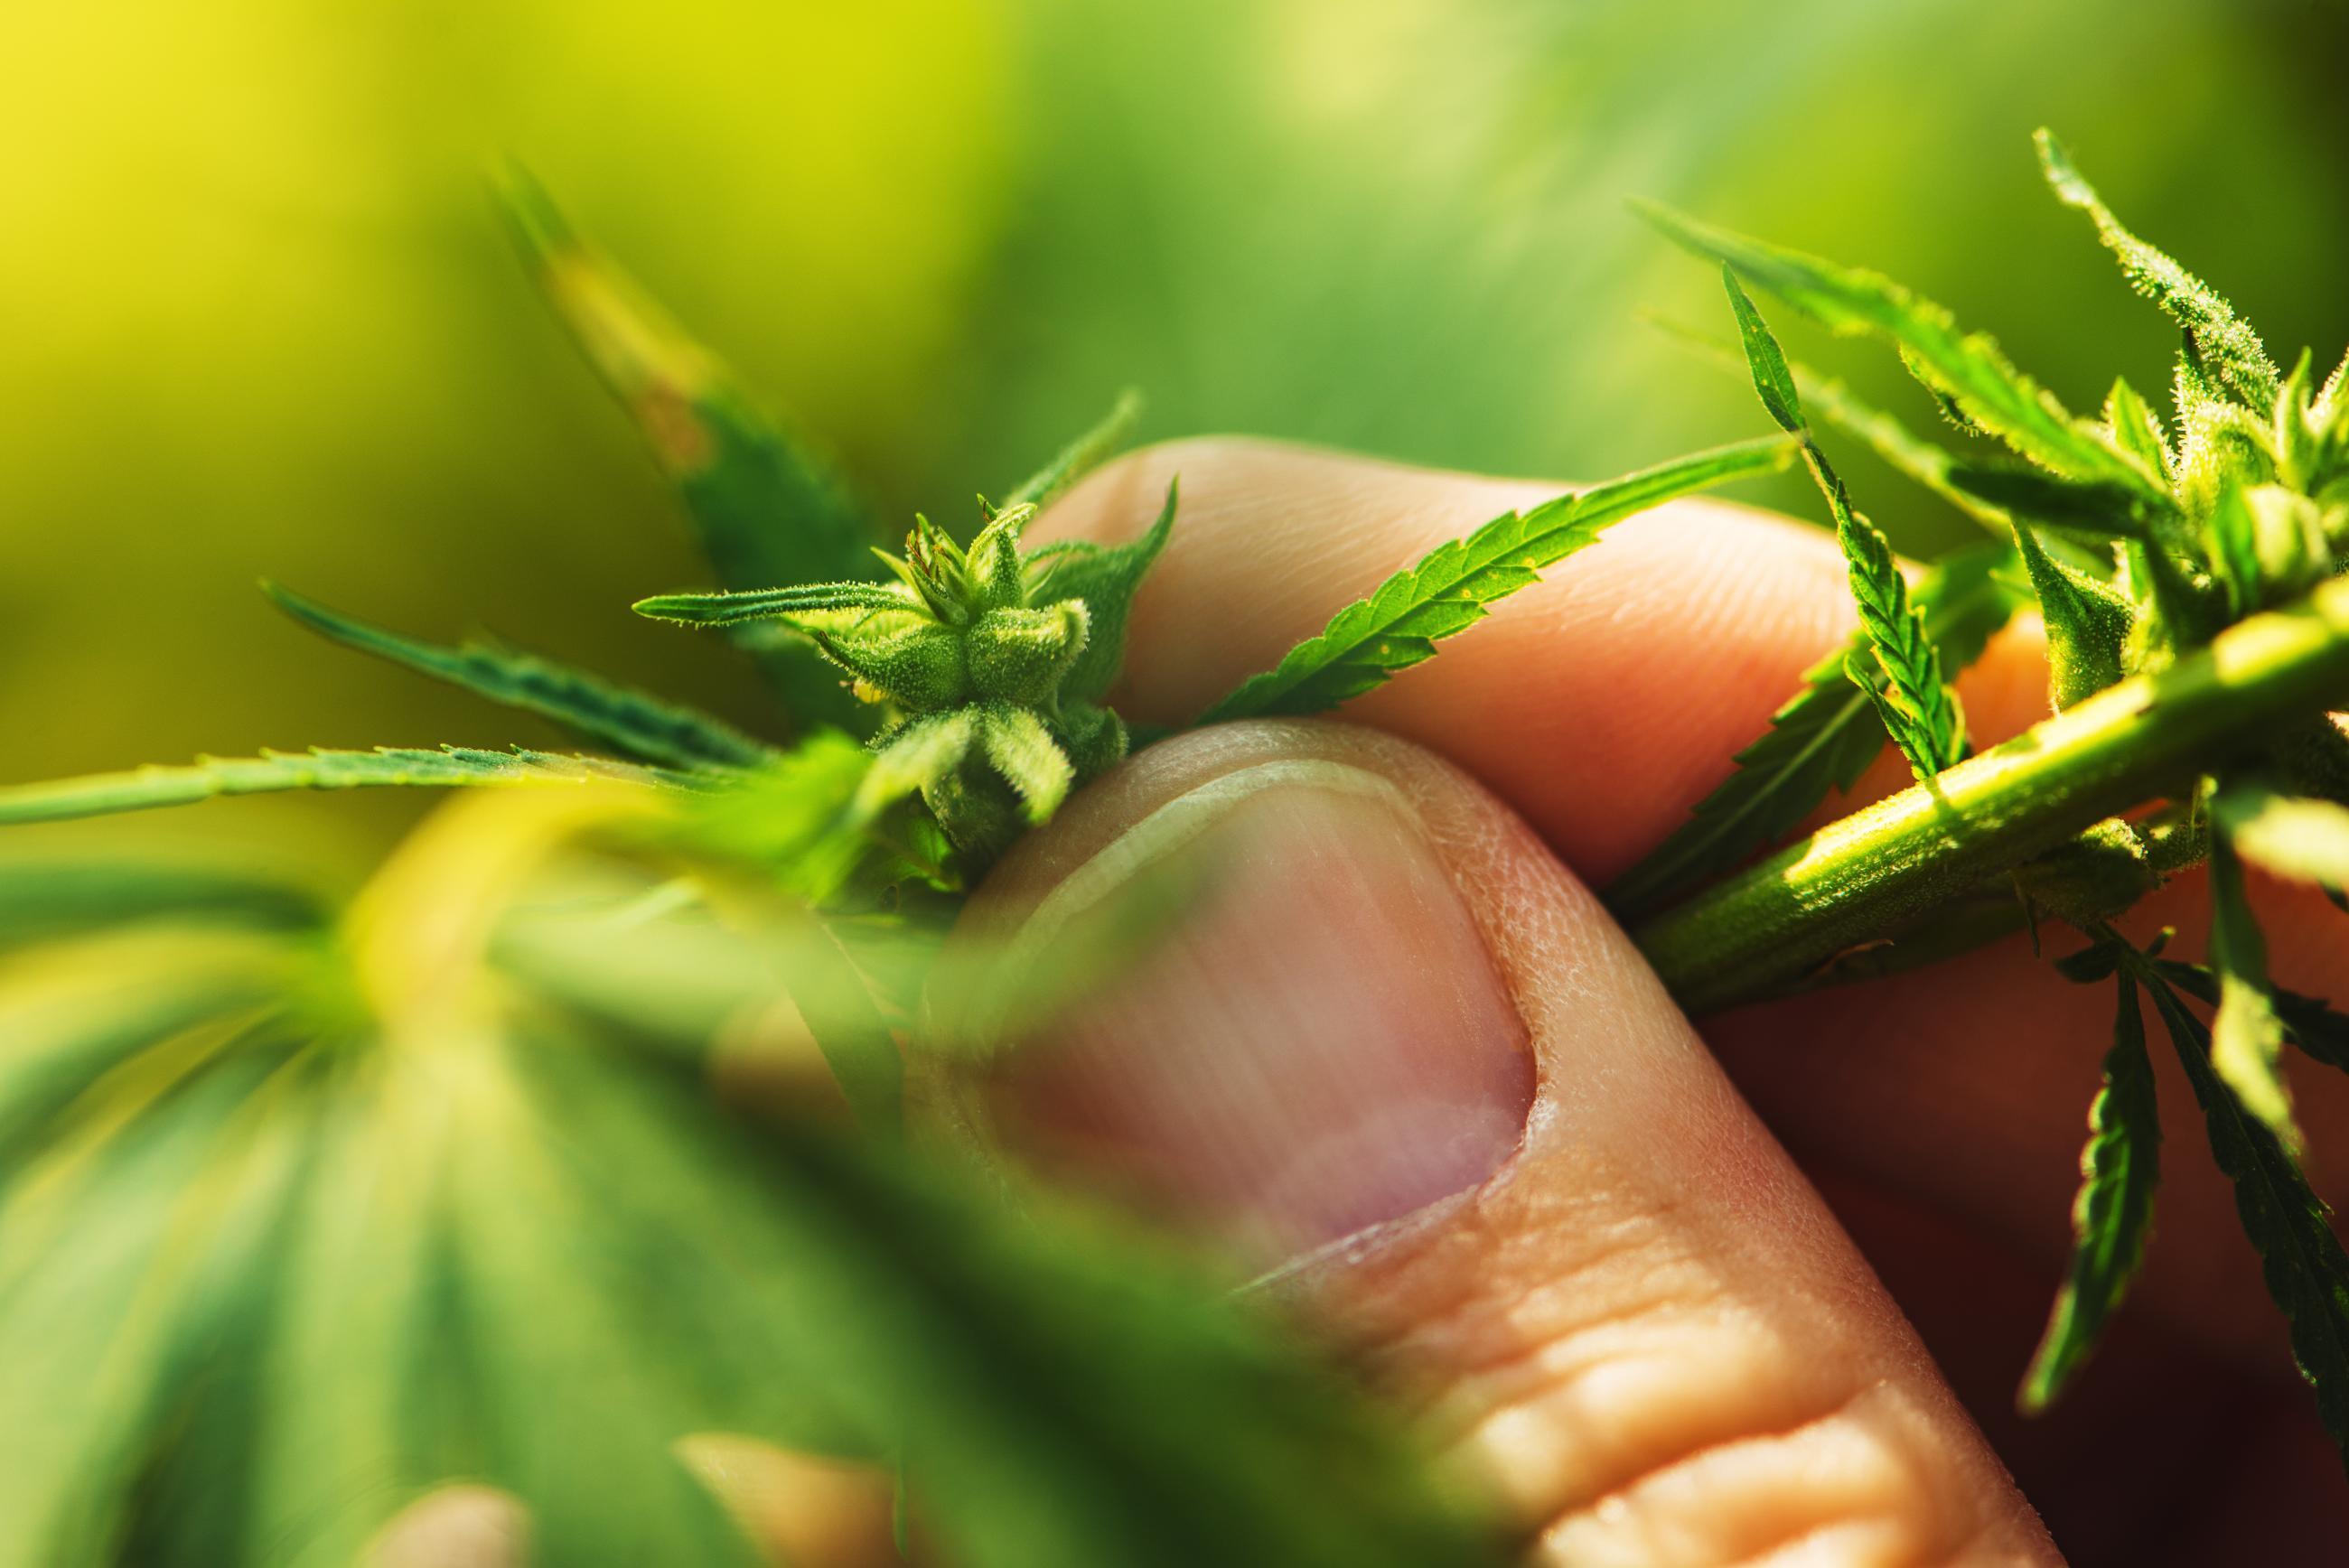 The Newest Method of Using Medical Marijuana: Dabbing | Marijuana Doctor